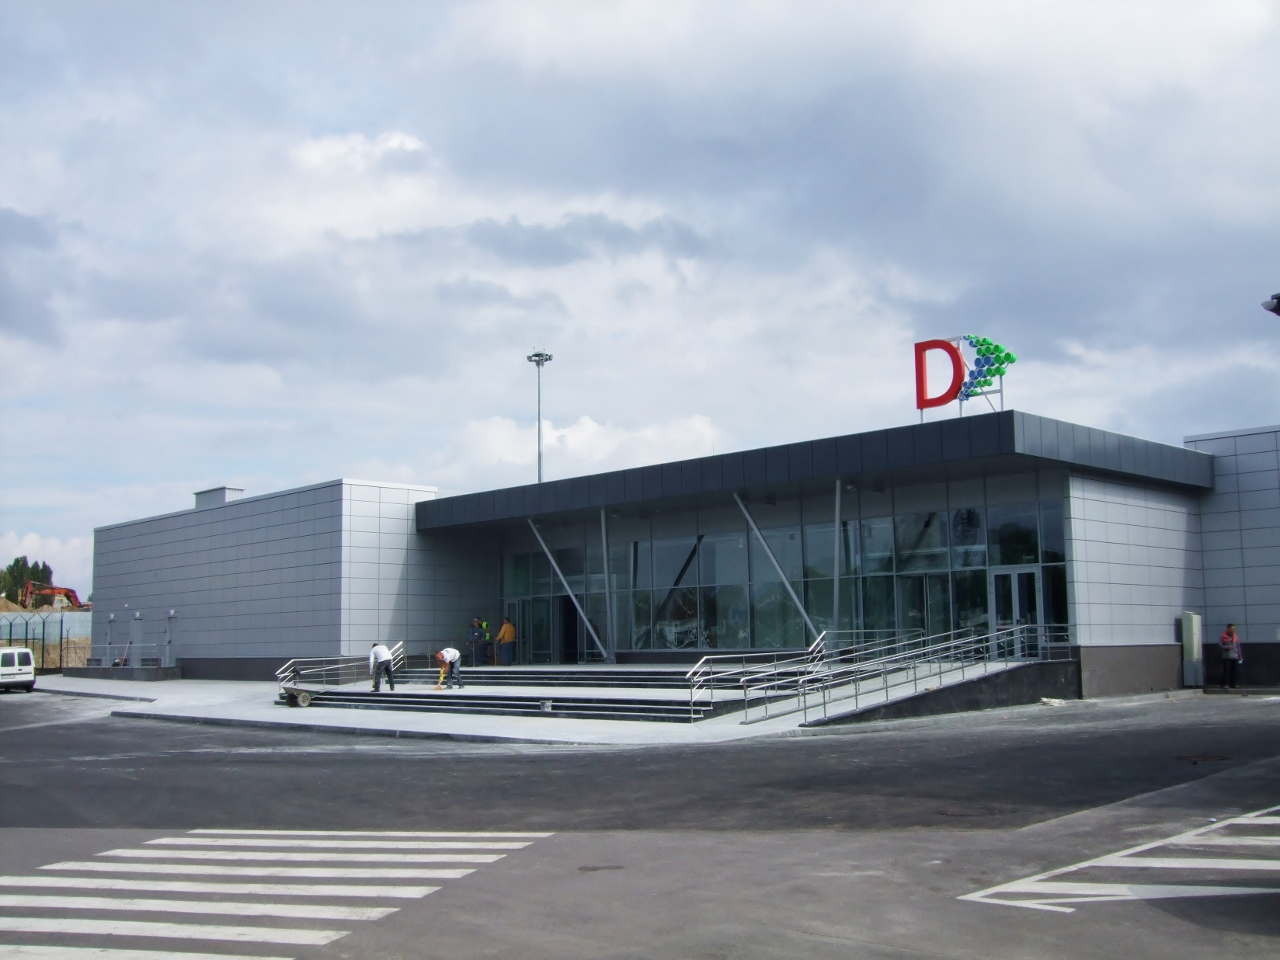 Киев, аэропорт Жуляны (IEV)